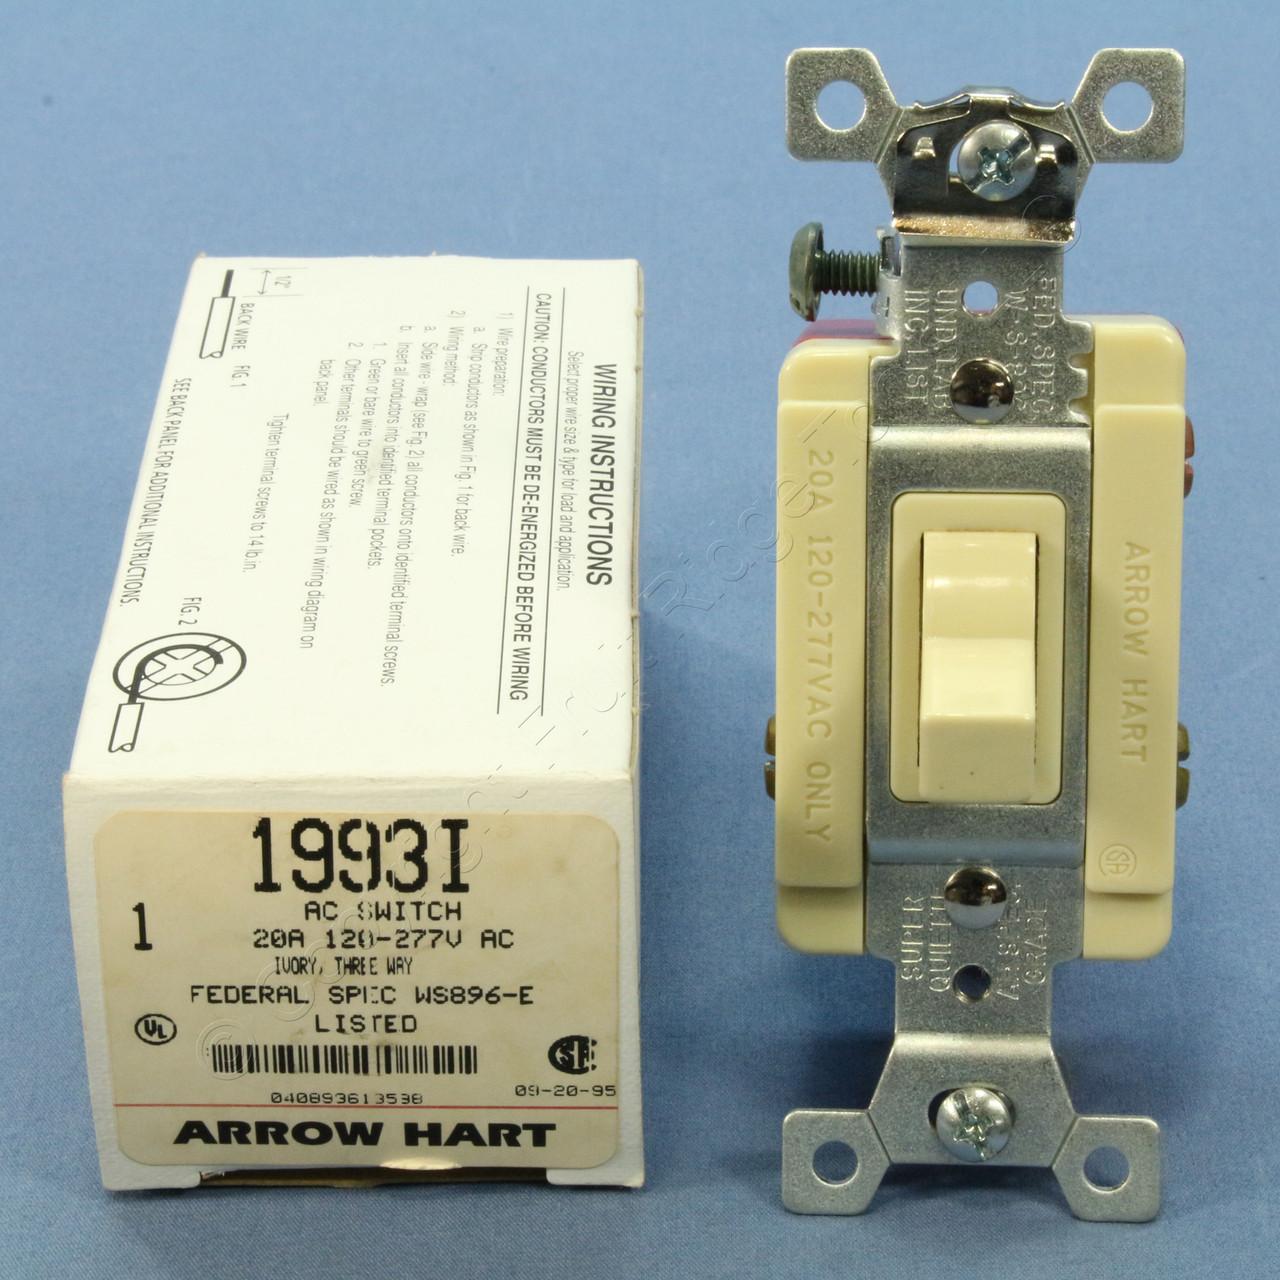 Arrow Hart Spec Grade Ivory 3Way Toggle Wall Light Switch Control 20A Bulk 8339I